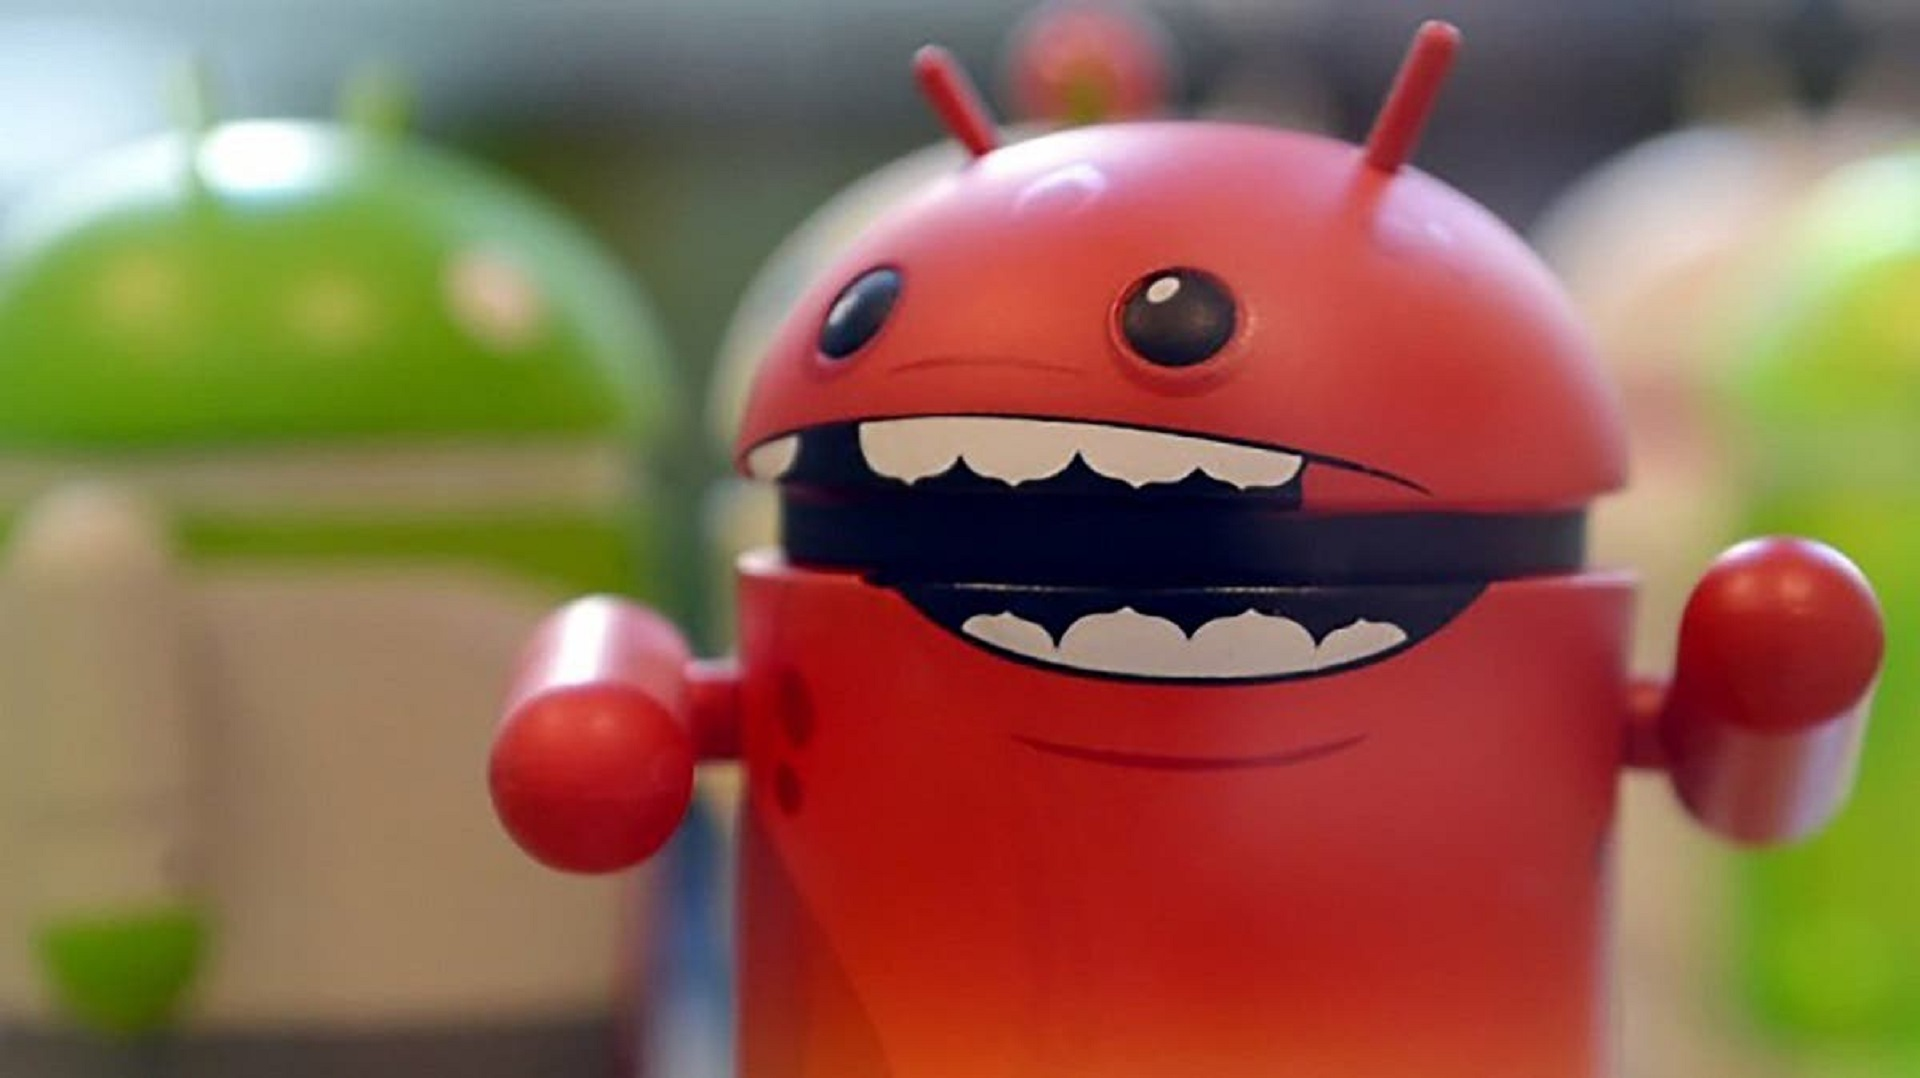 android_malware43c7dc9eadfb8974-jpg.13300